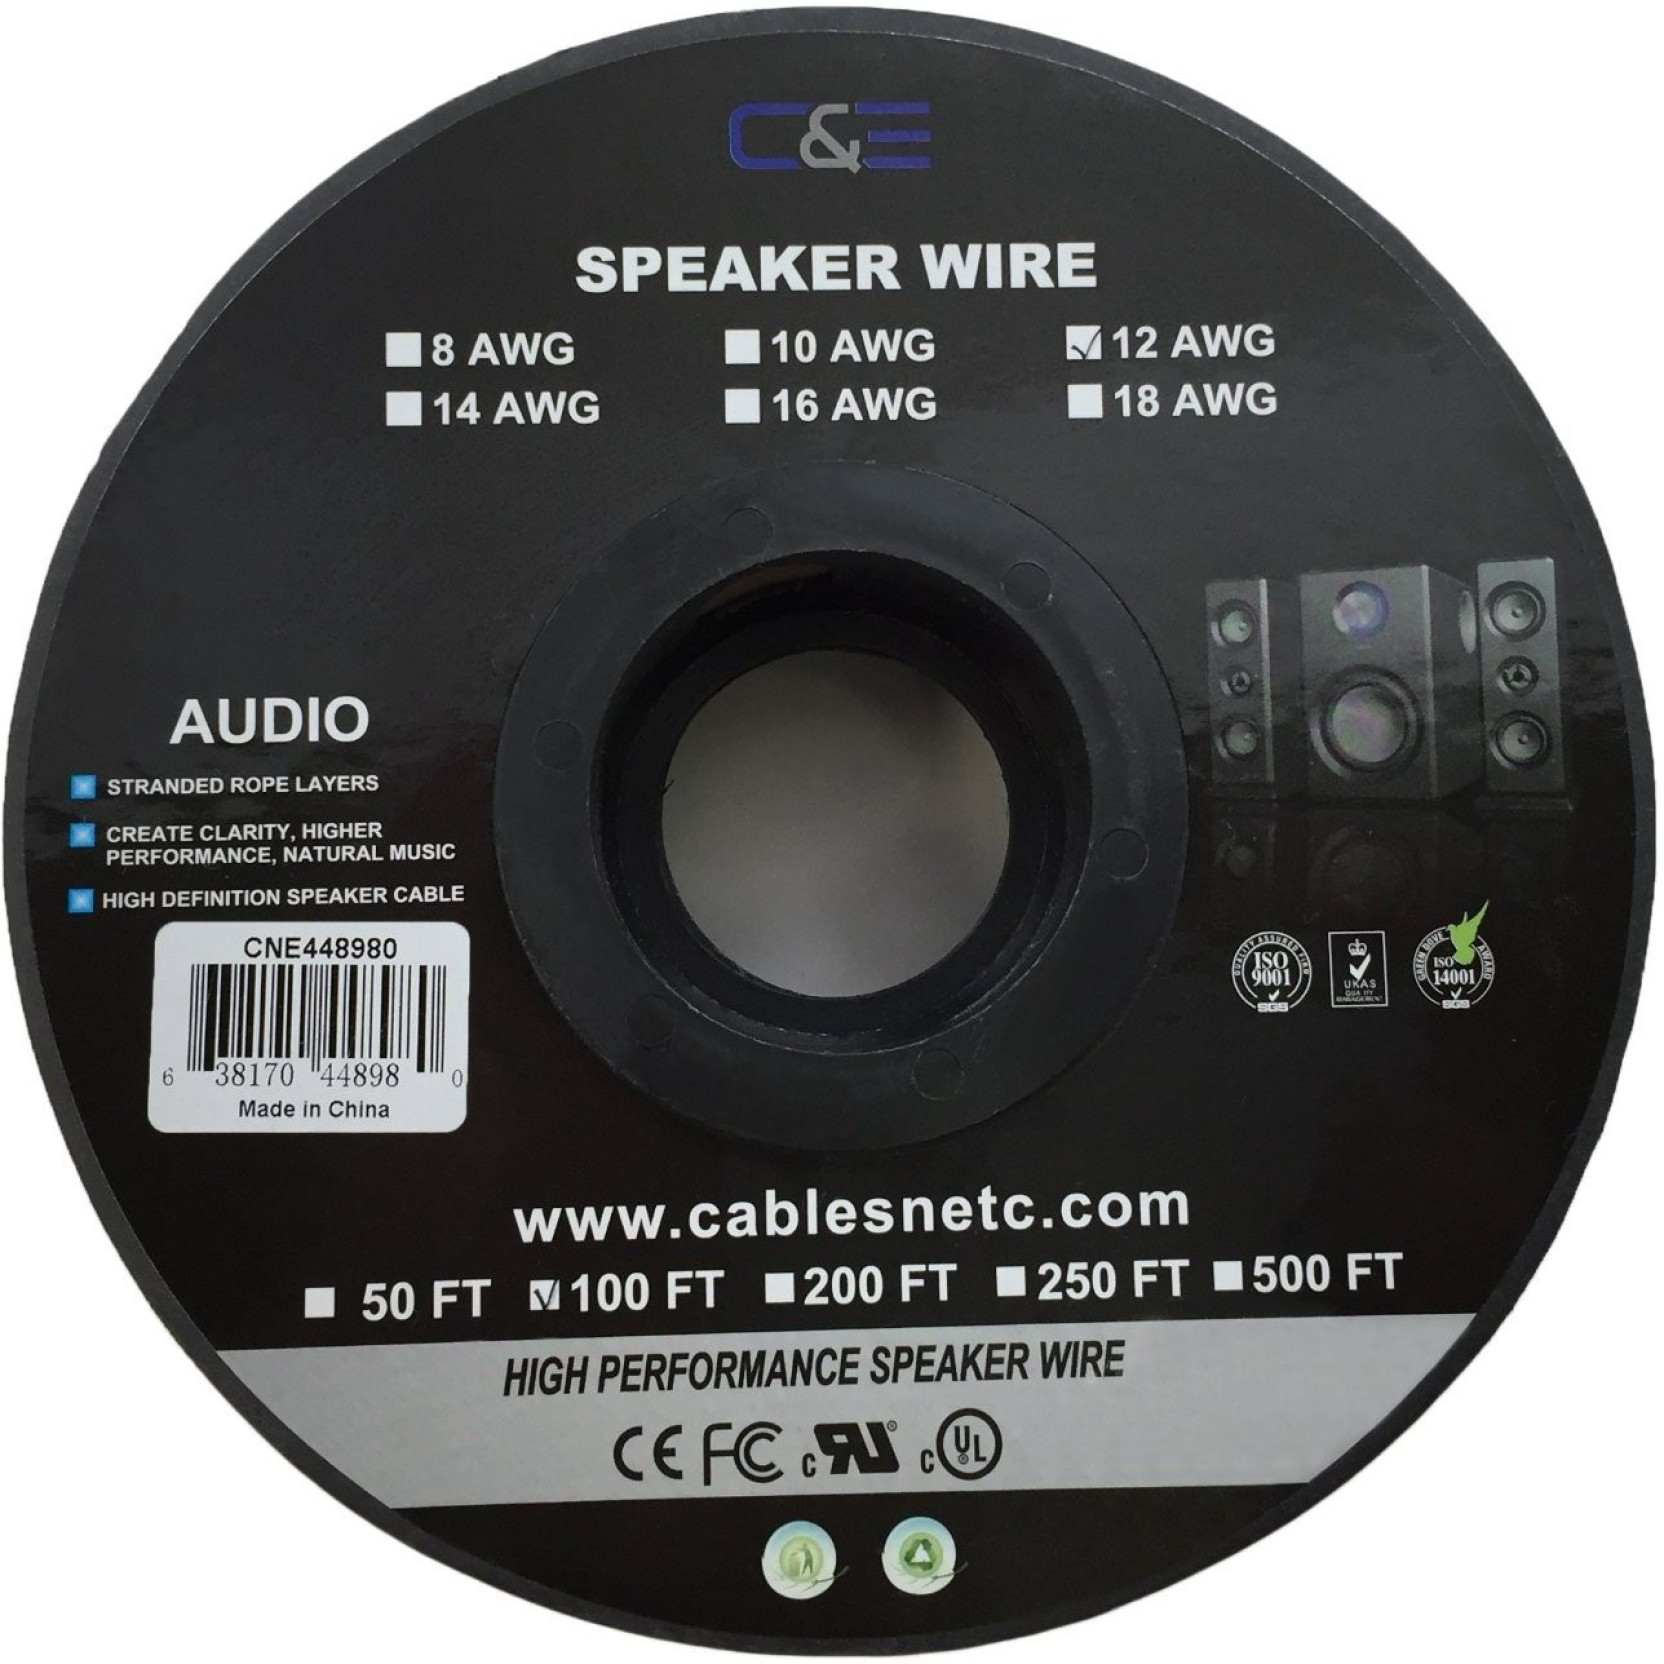 C&E 12 Gauge Copper Wire Price in India - Buy C&E 12 Gauge Copper ...